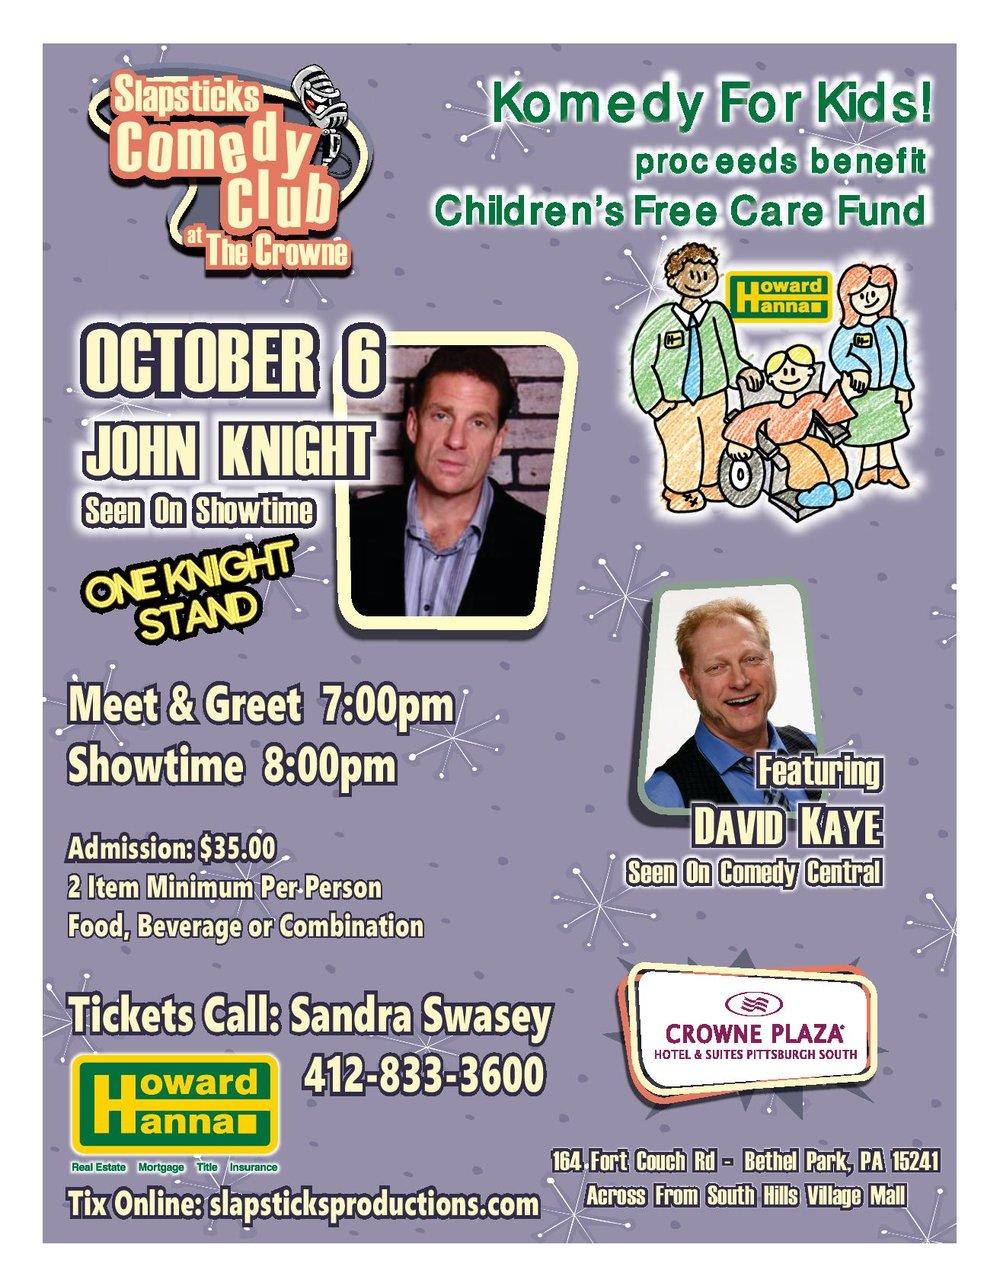 10-6-17 Howard hanna Funny Fundraiser 85 x 11 HAND BILL - PRINT READY-page-001.jpg